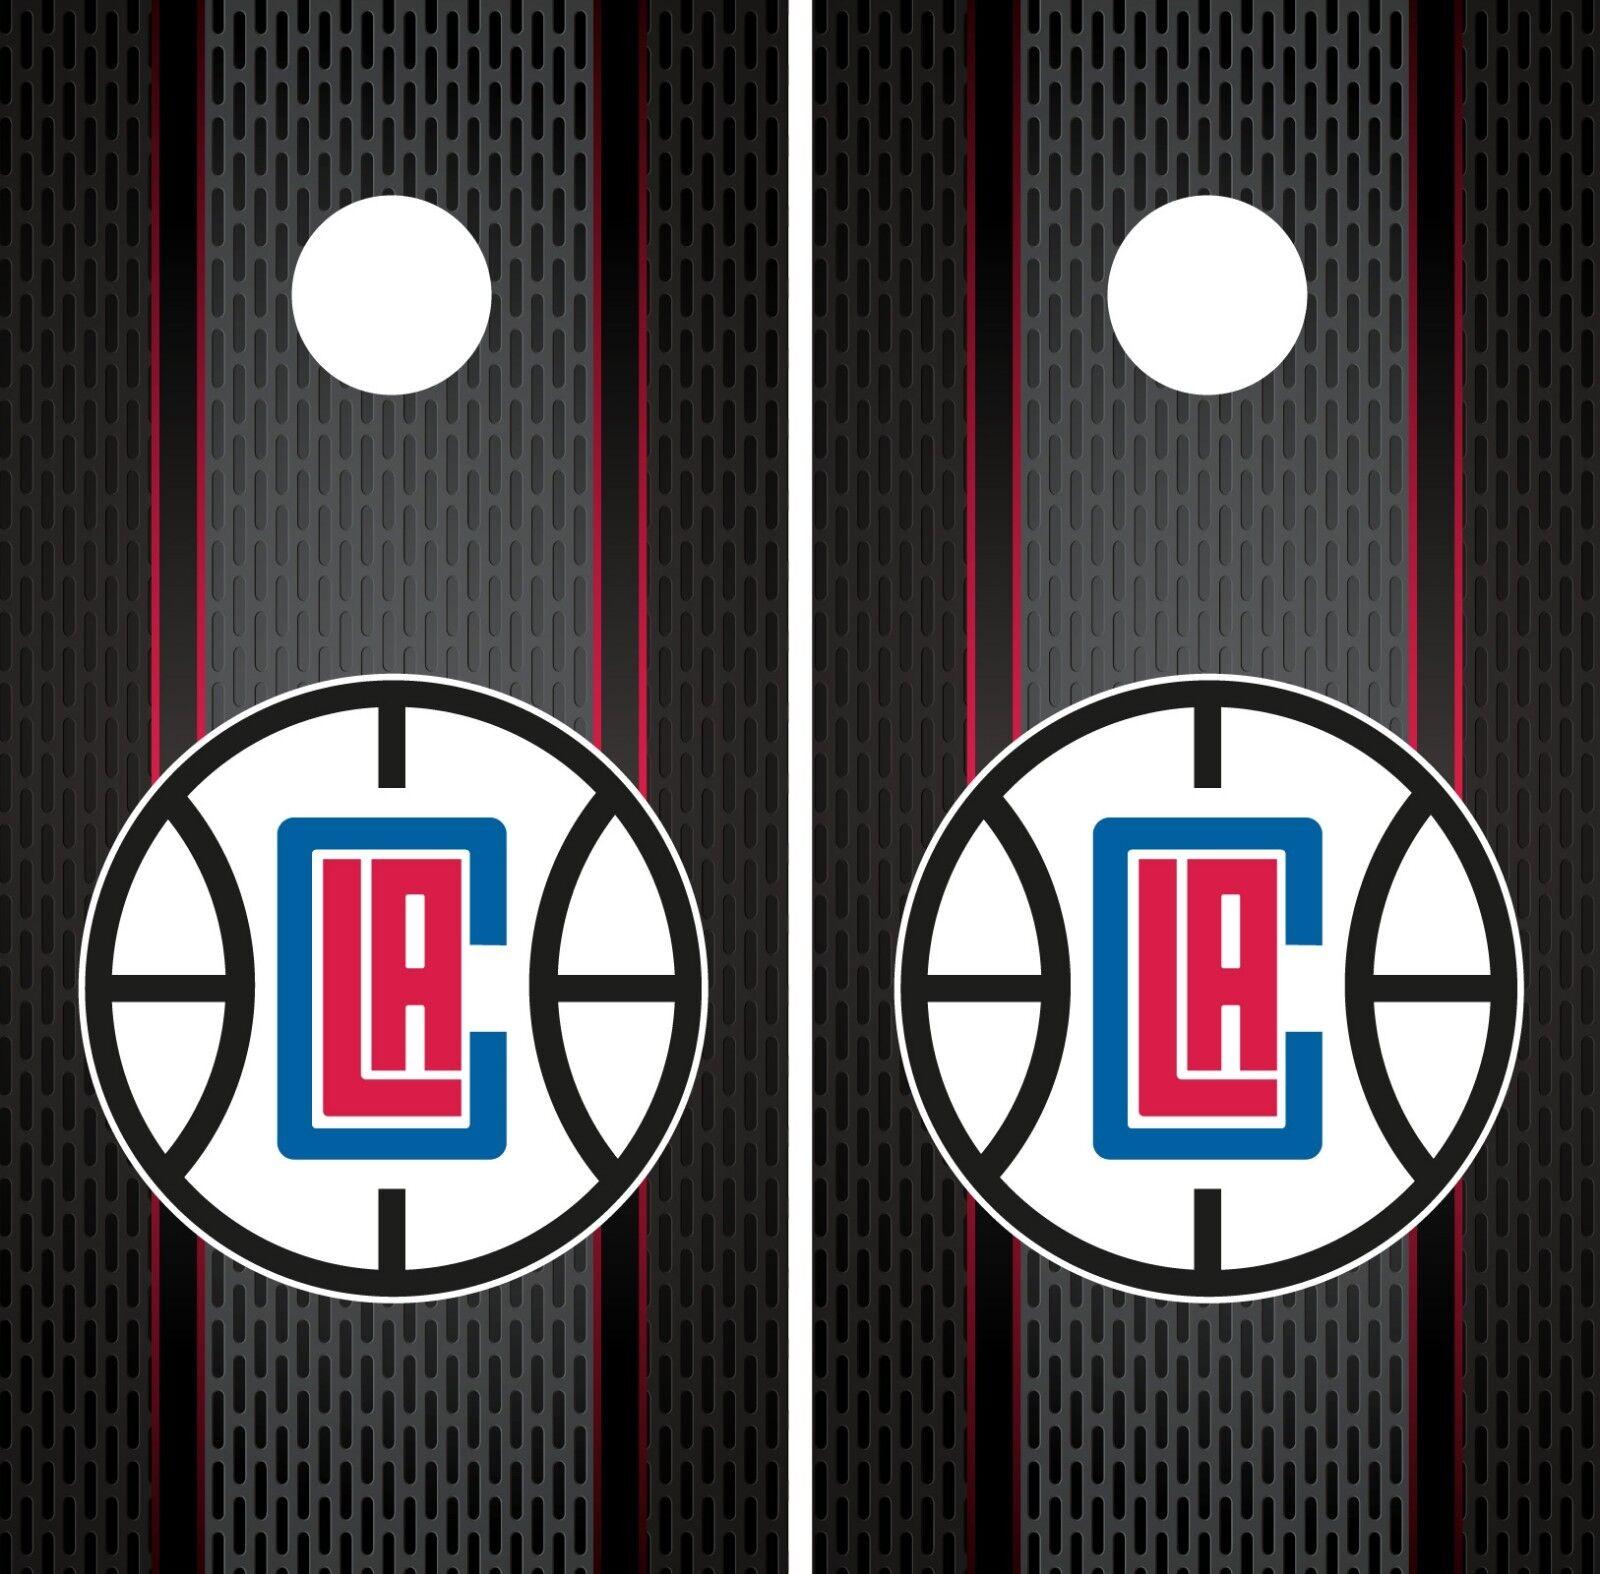 LA Clippers Cornhole Wrap NBA Game Board Skin Set Vinyl Decal Decor CO627